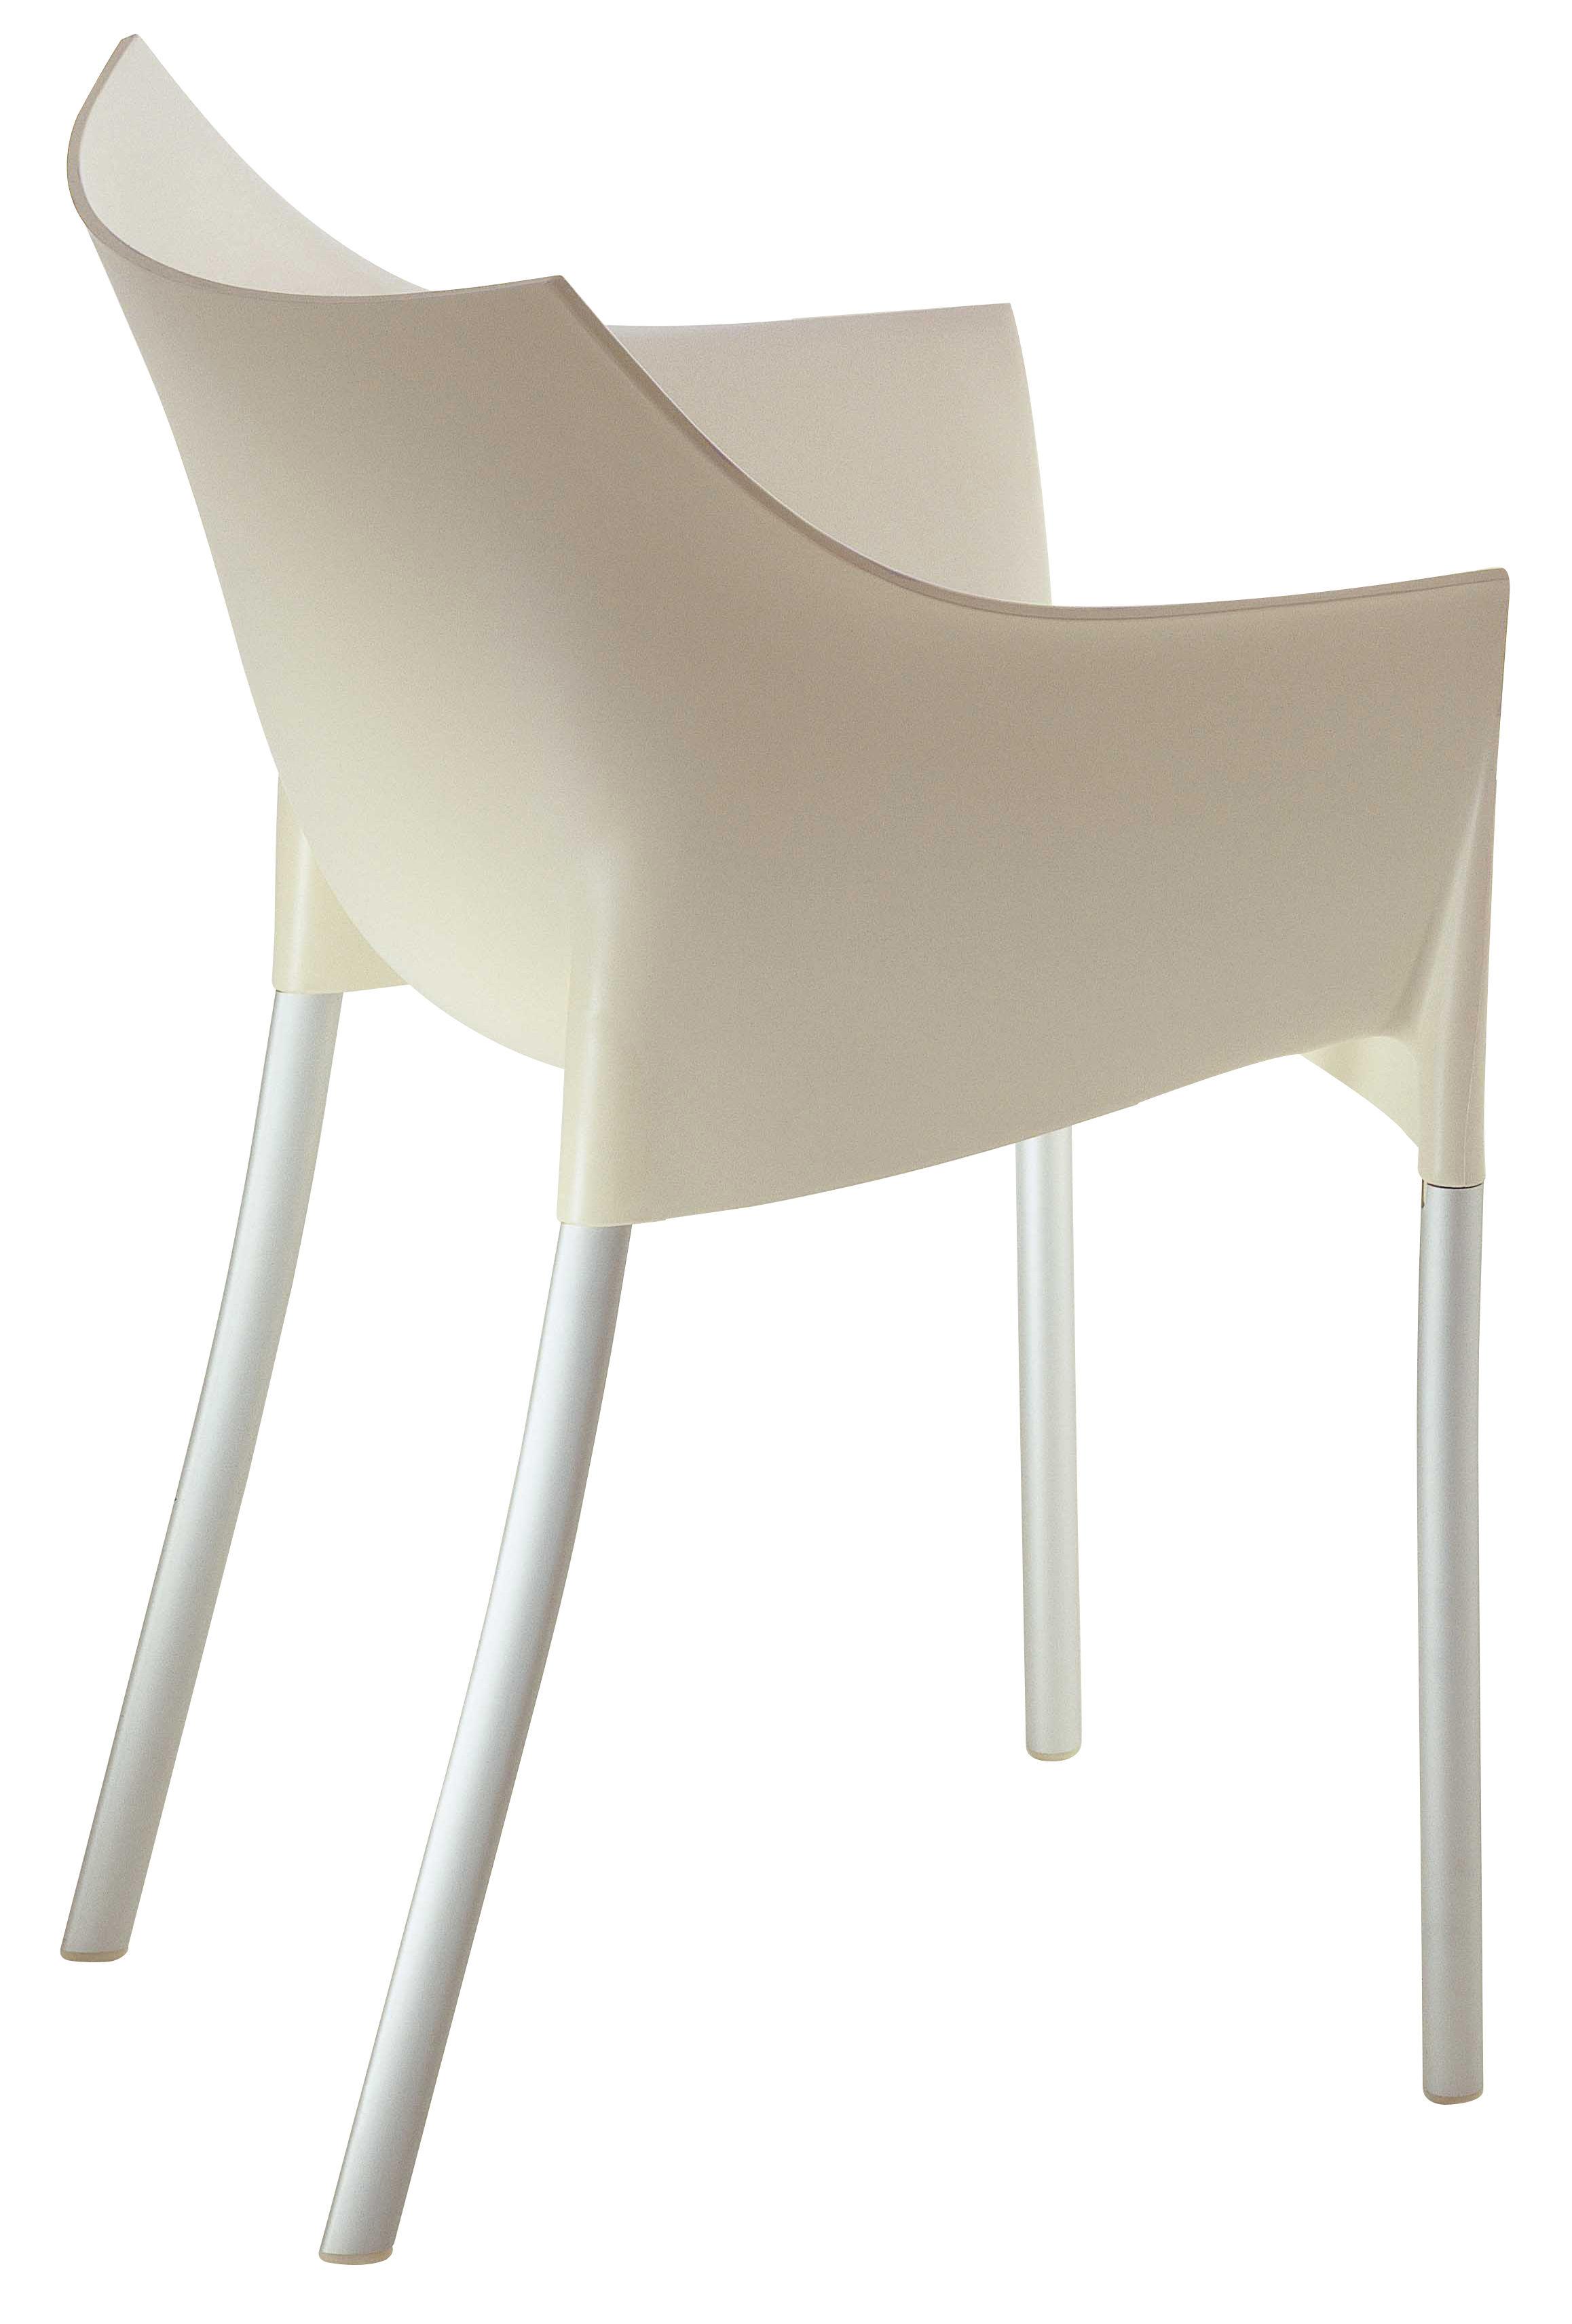 Dr No Stackable Armchair Plastic & Metal Legs White